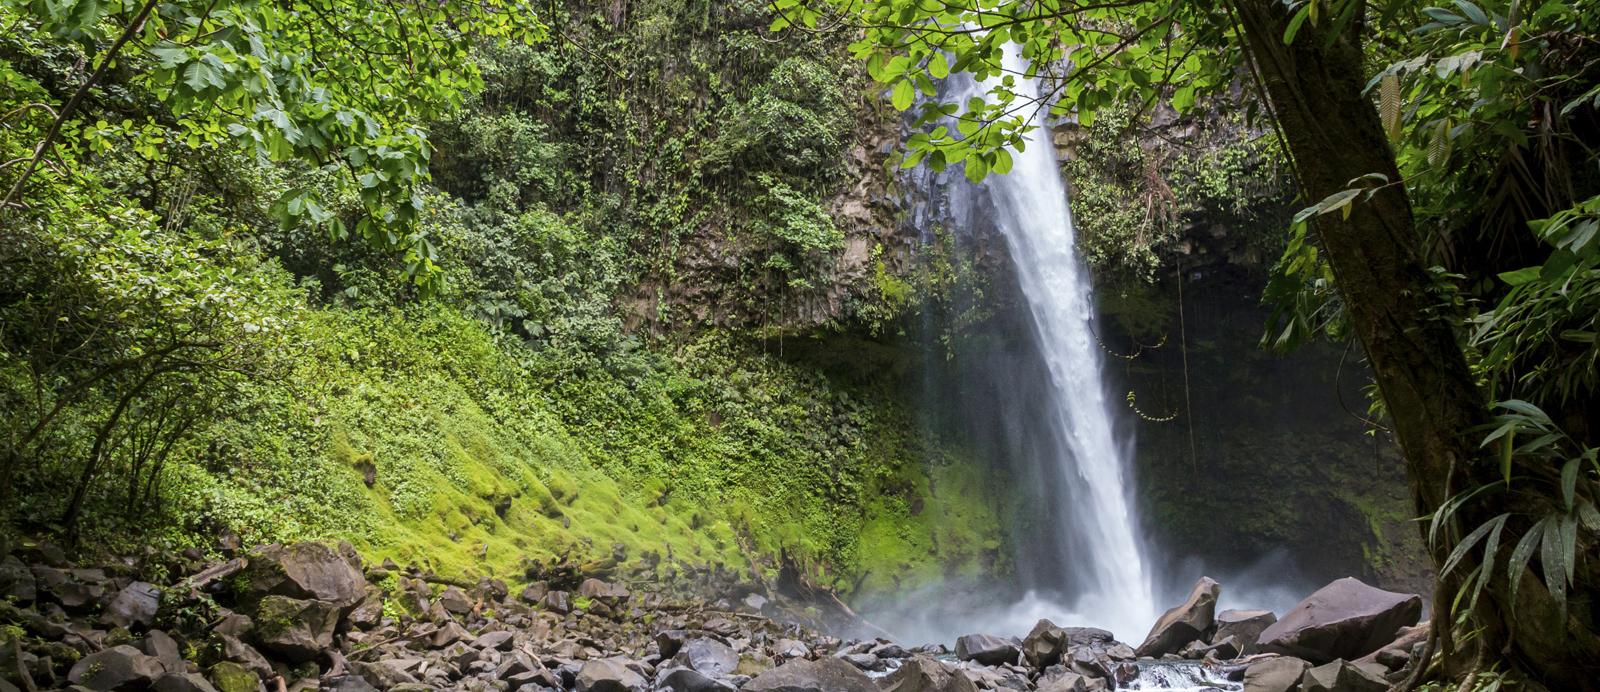 waterfall-jungle1 edited.jpg